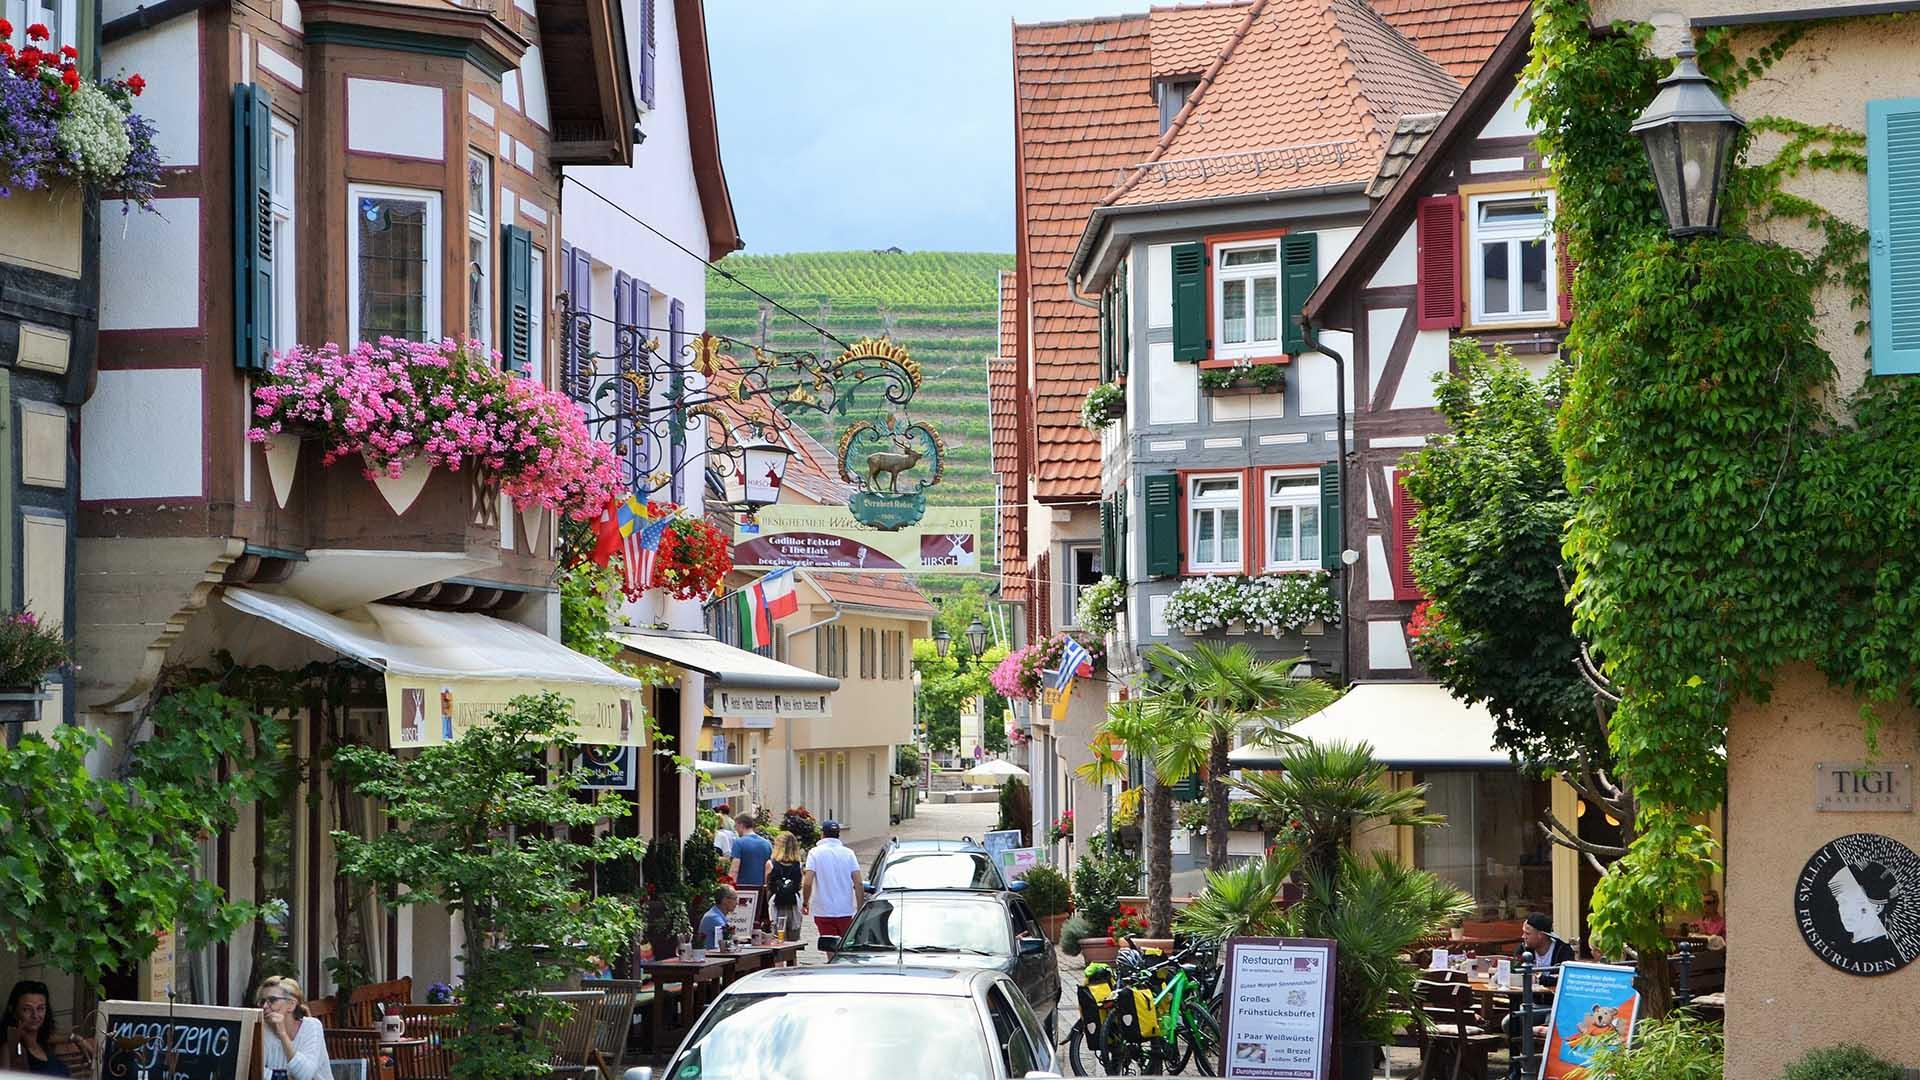 Home-weinblick-besigheim-stadt